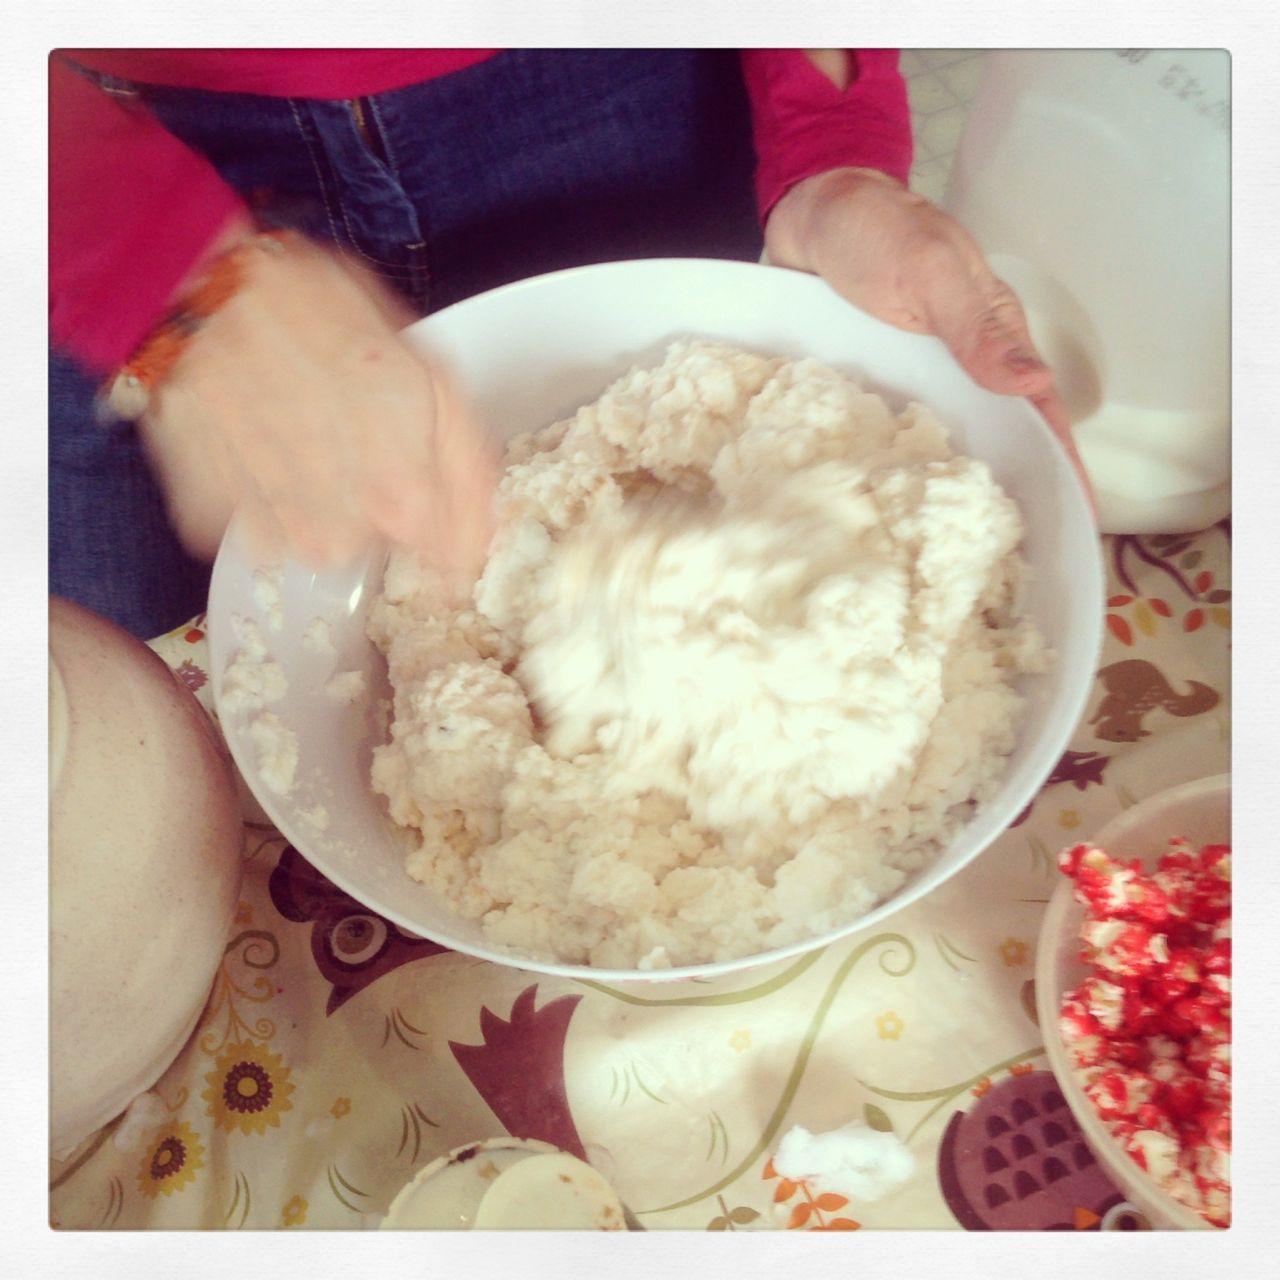 Snow ice-cream! Yummers!